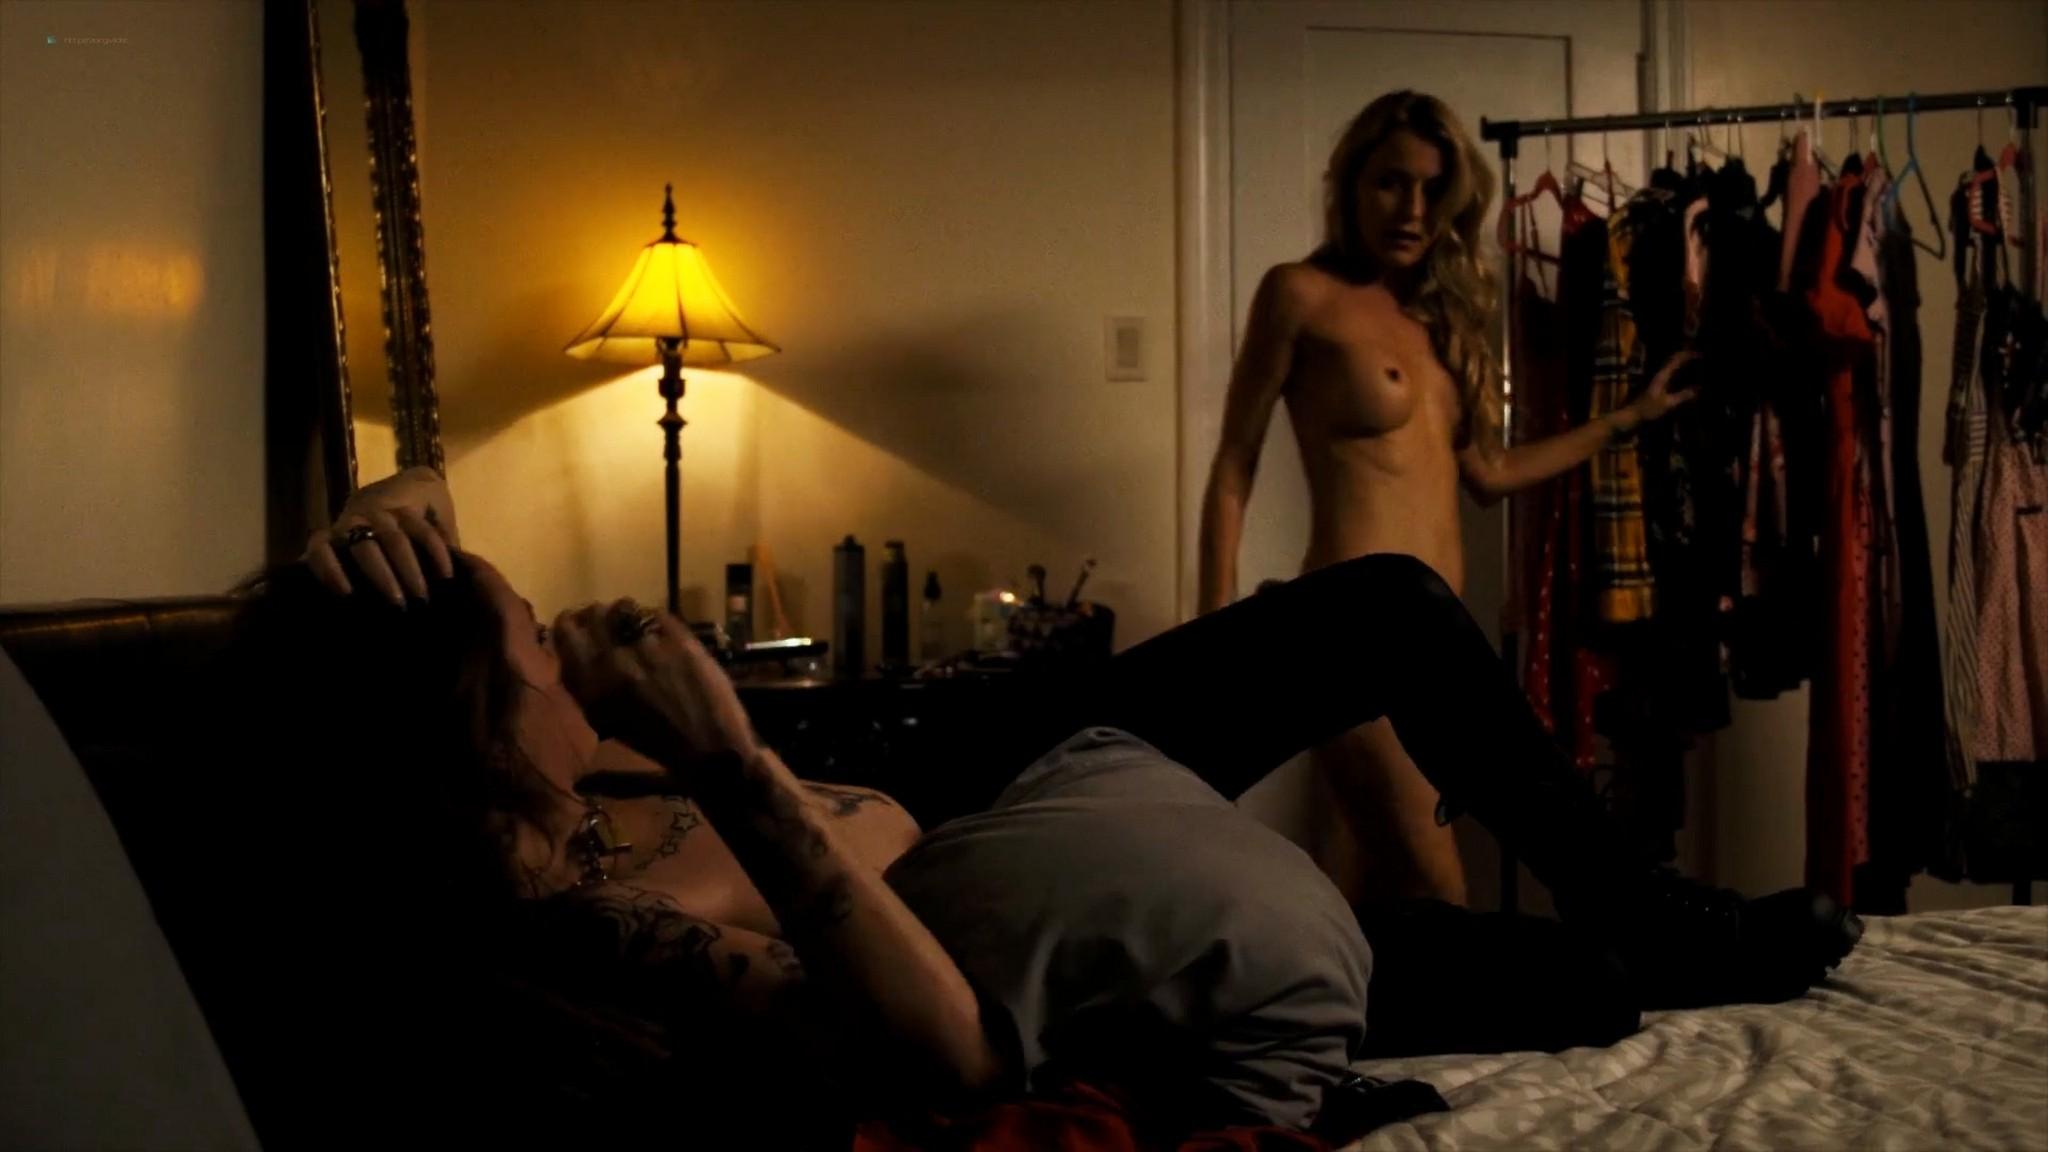 Sadie Katz nude lesbian sex with Victoria De Mare - Hanukkah (2019) HD 1080p Web (14)